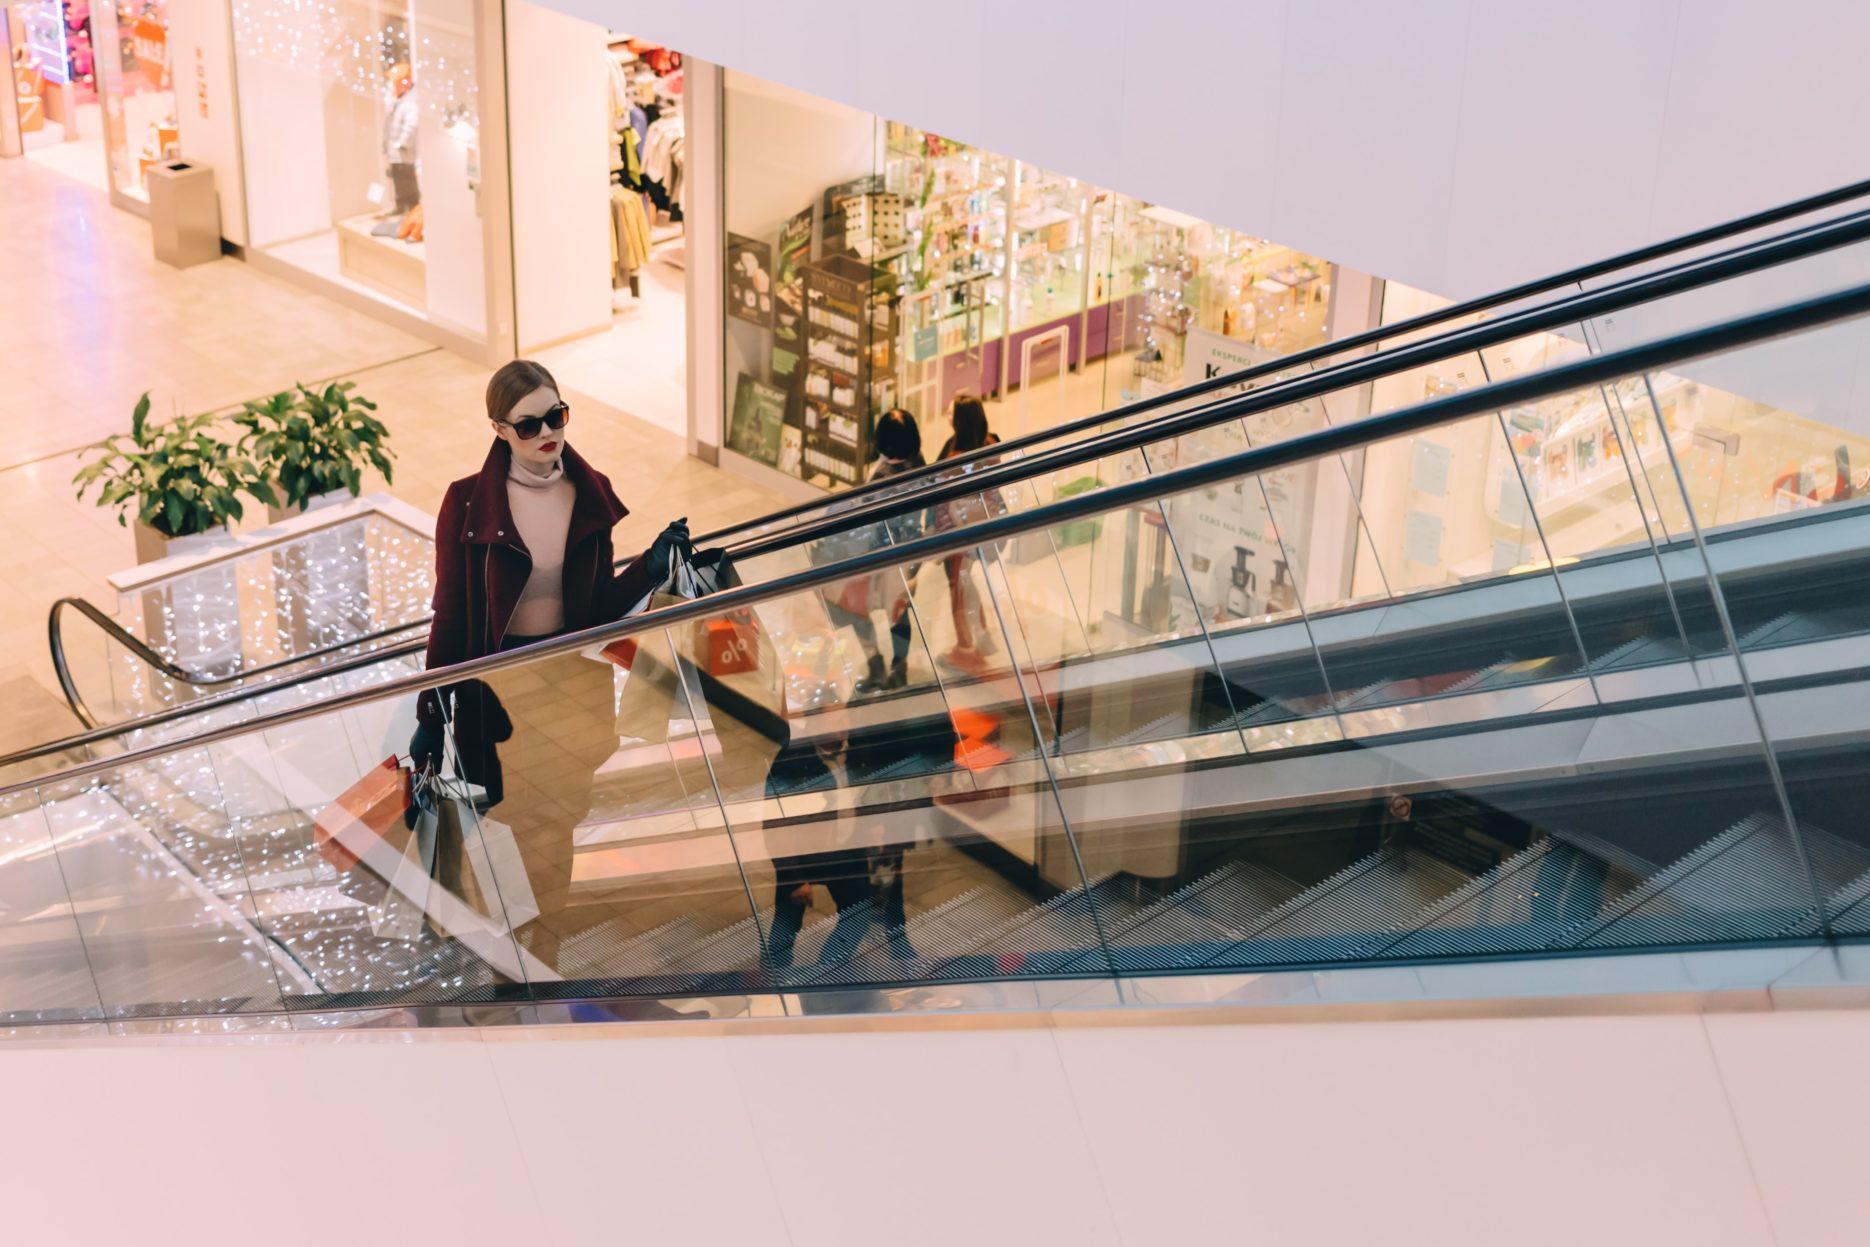 Shopping in China. Credit: Unsplash